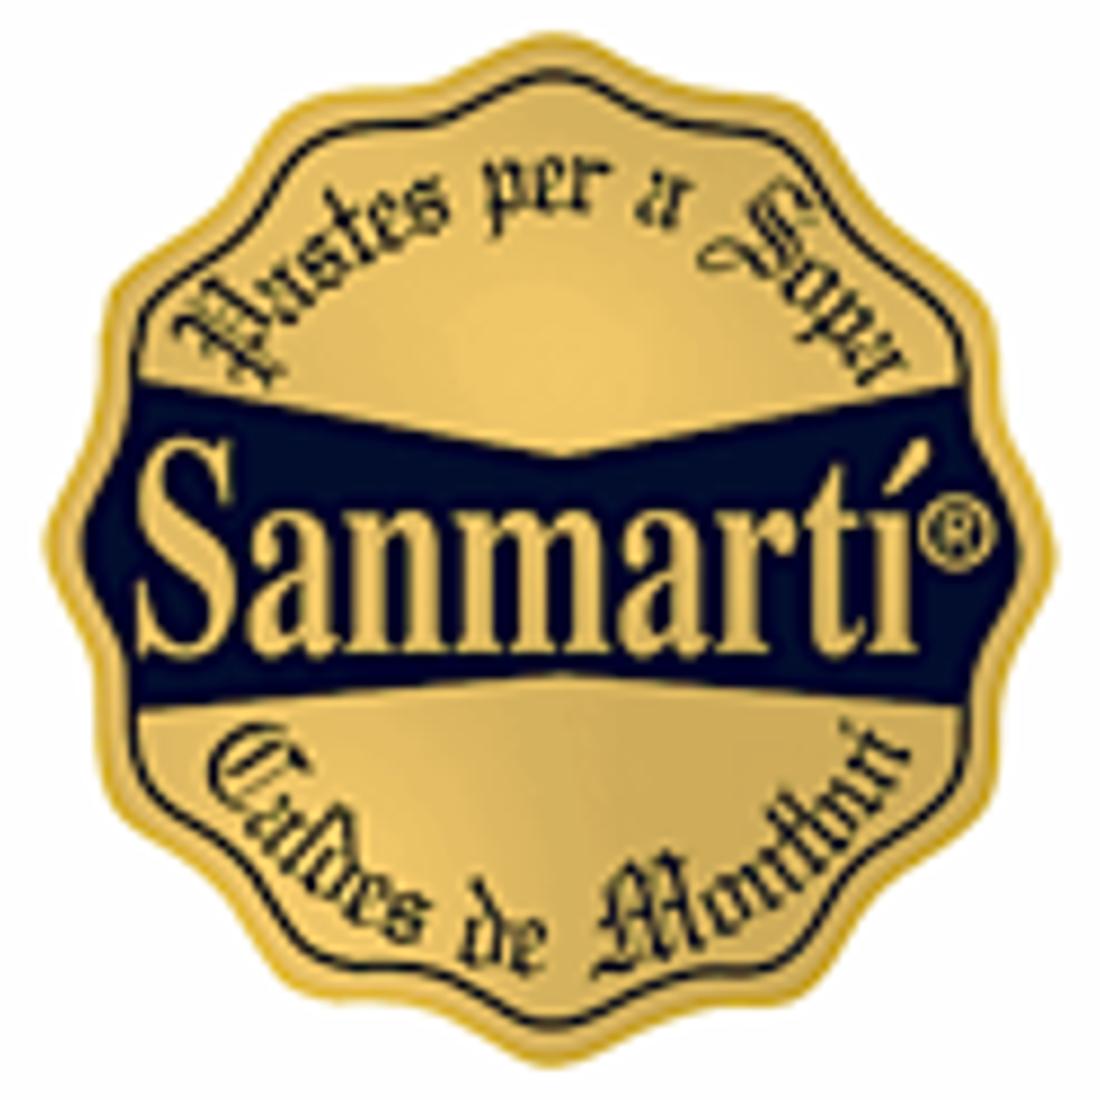 Pastas San Martí